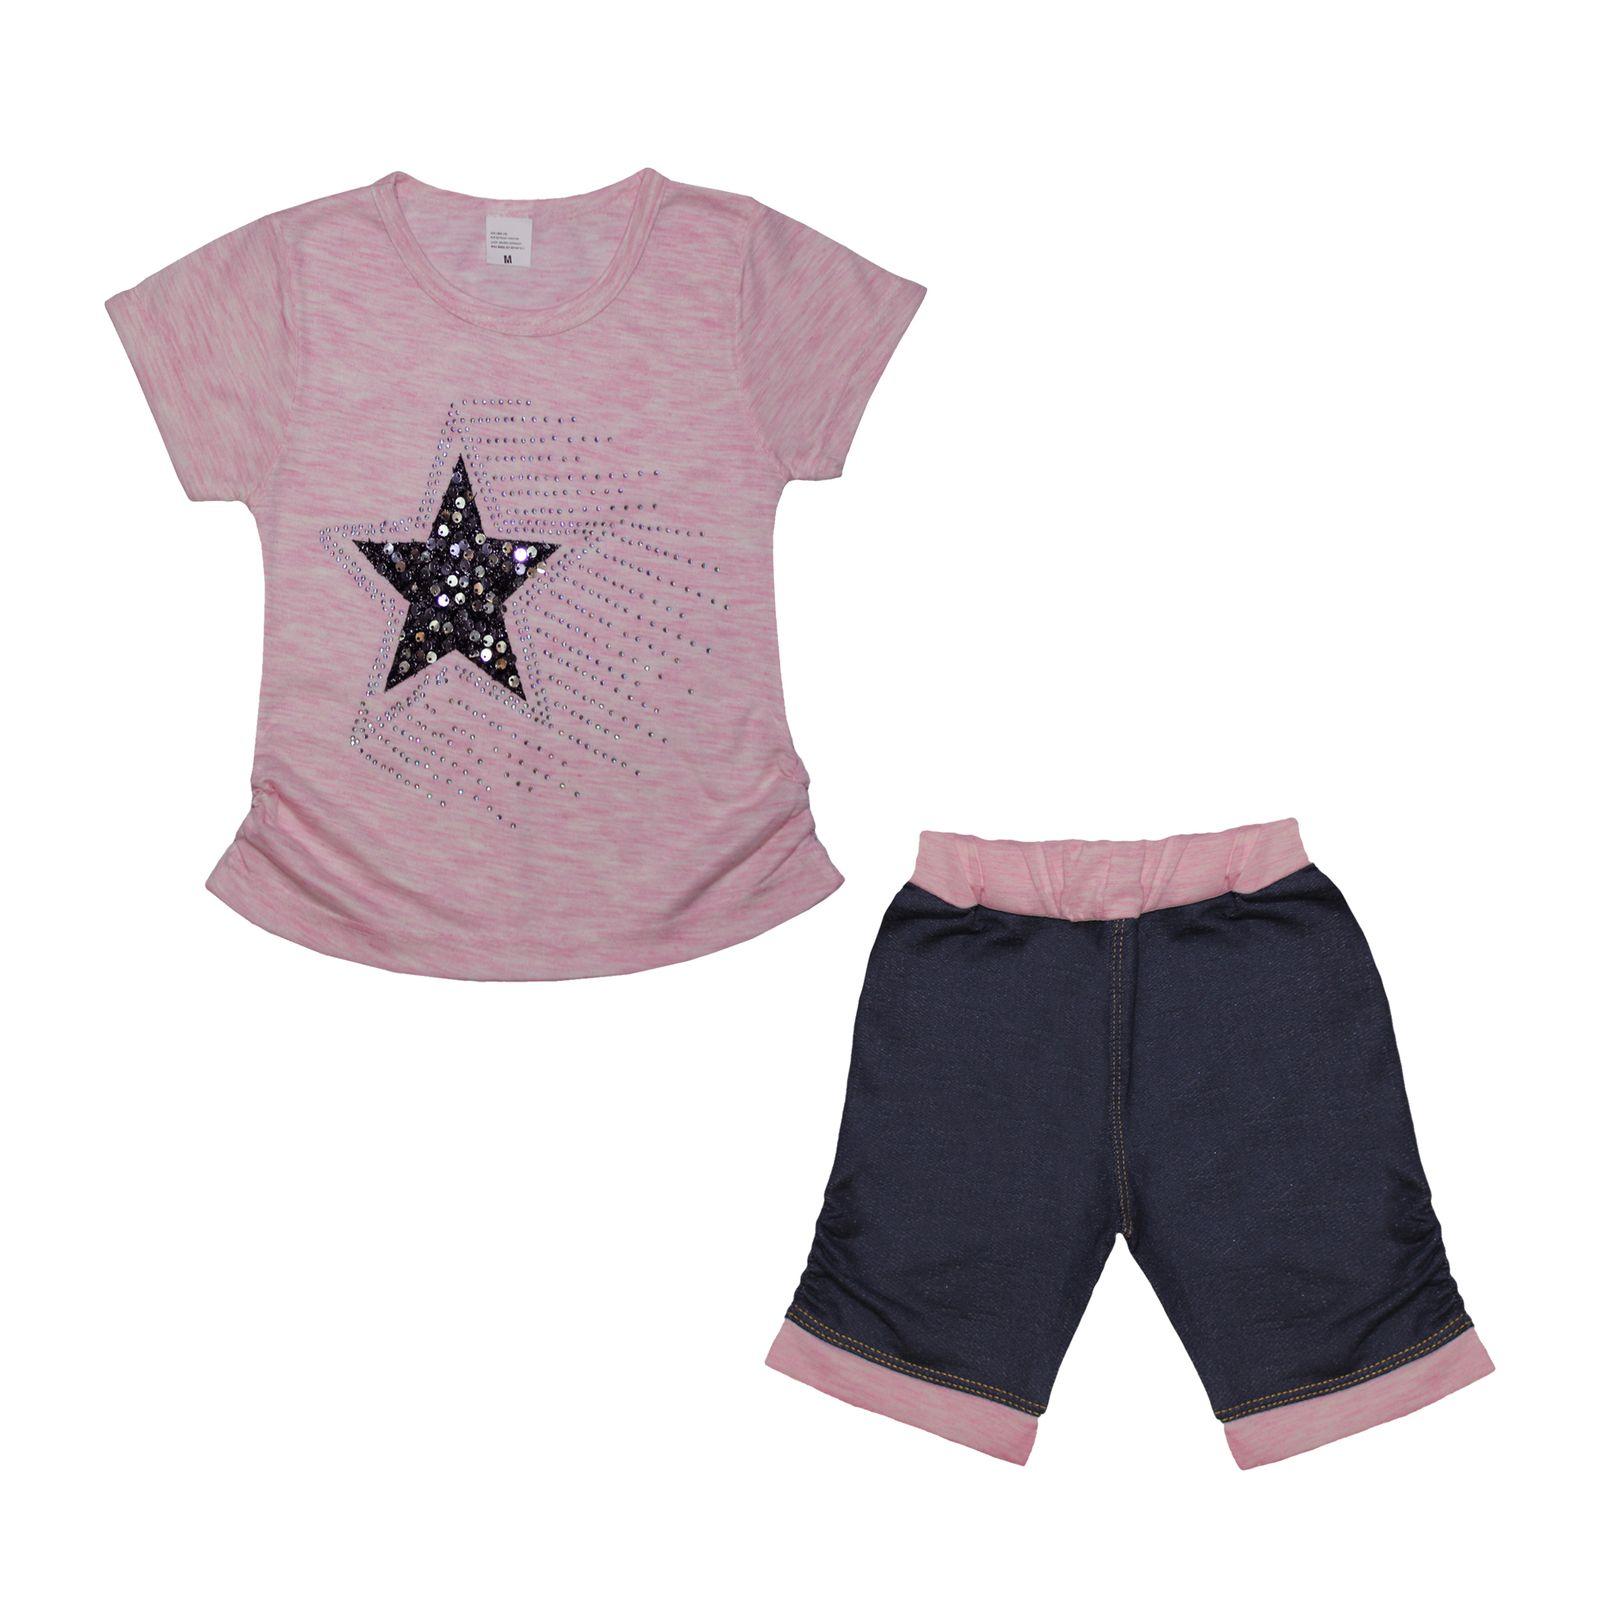 ست تیشرت و شلوارک دخترانه طرح ستاره کد ۱۳۶۲ -  - 2